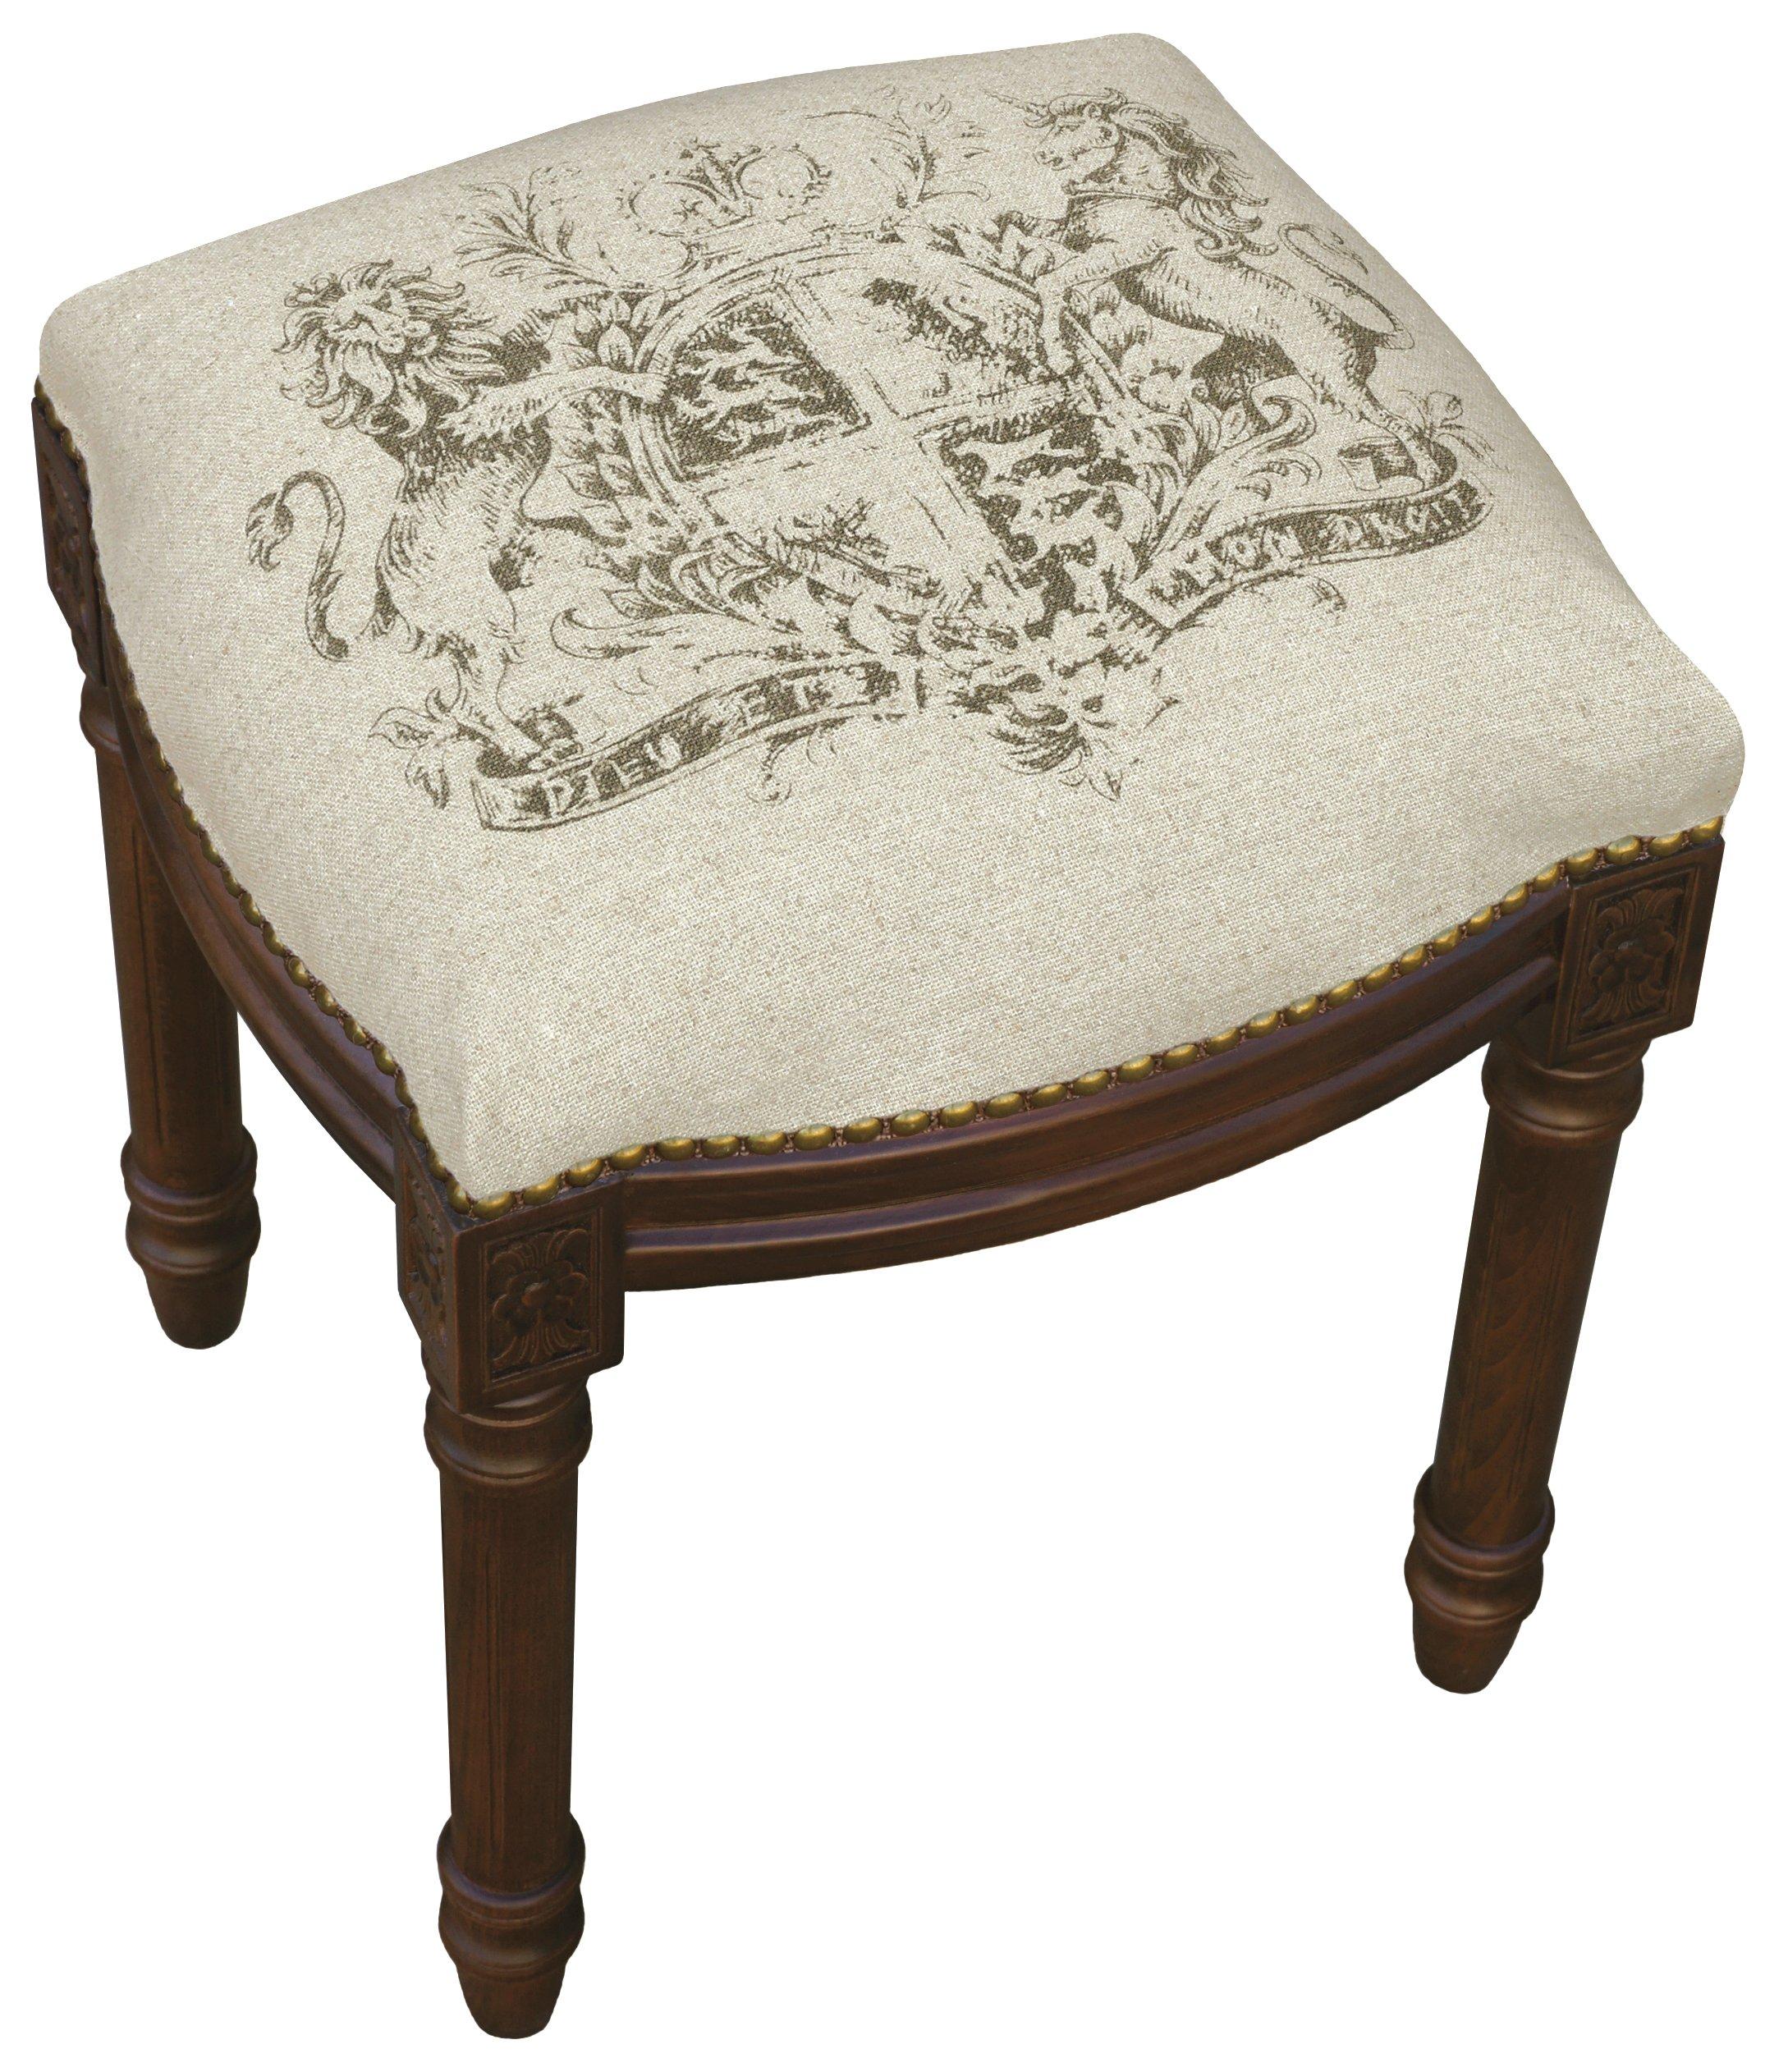 SketchONE Linen Upholstered Vanity Stool, Crest, Smoky Gray